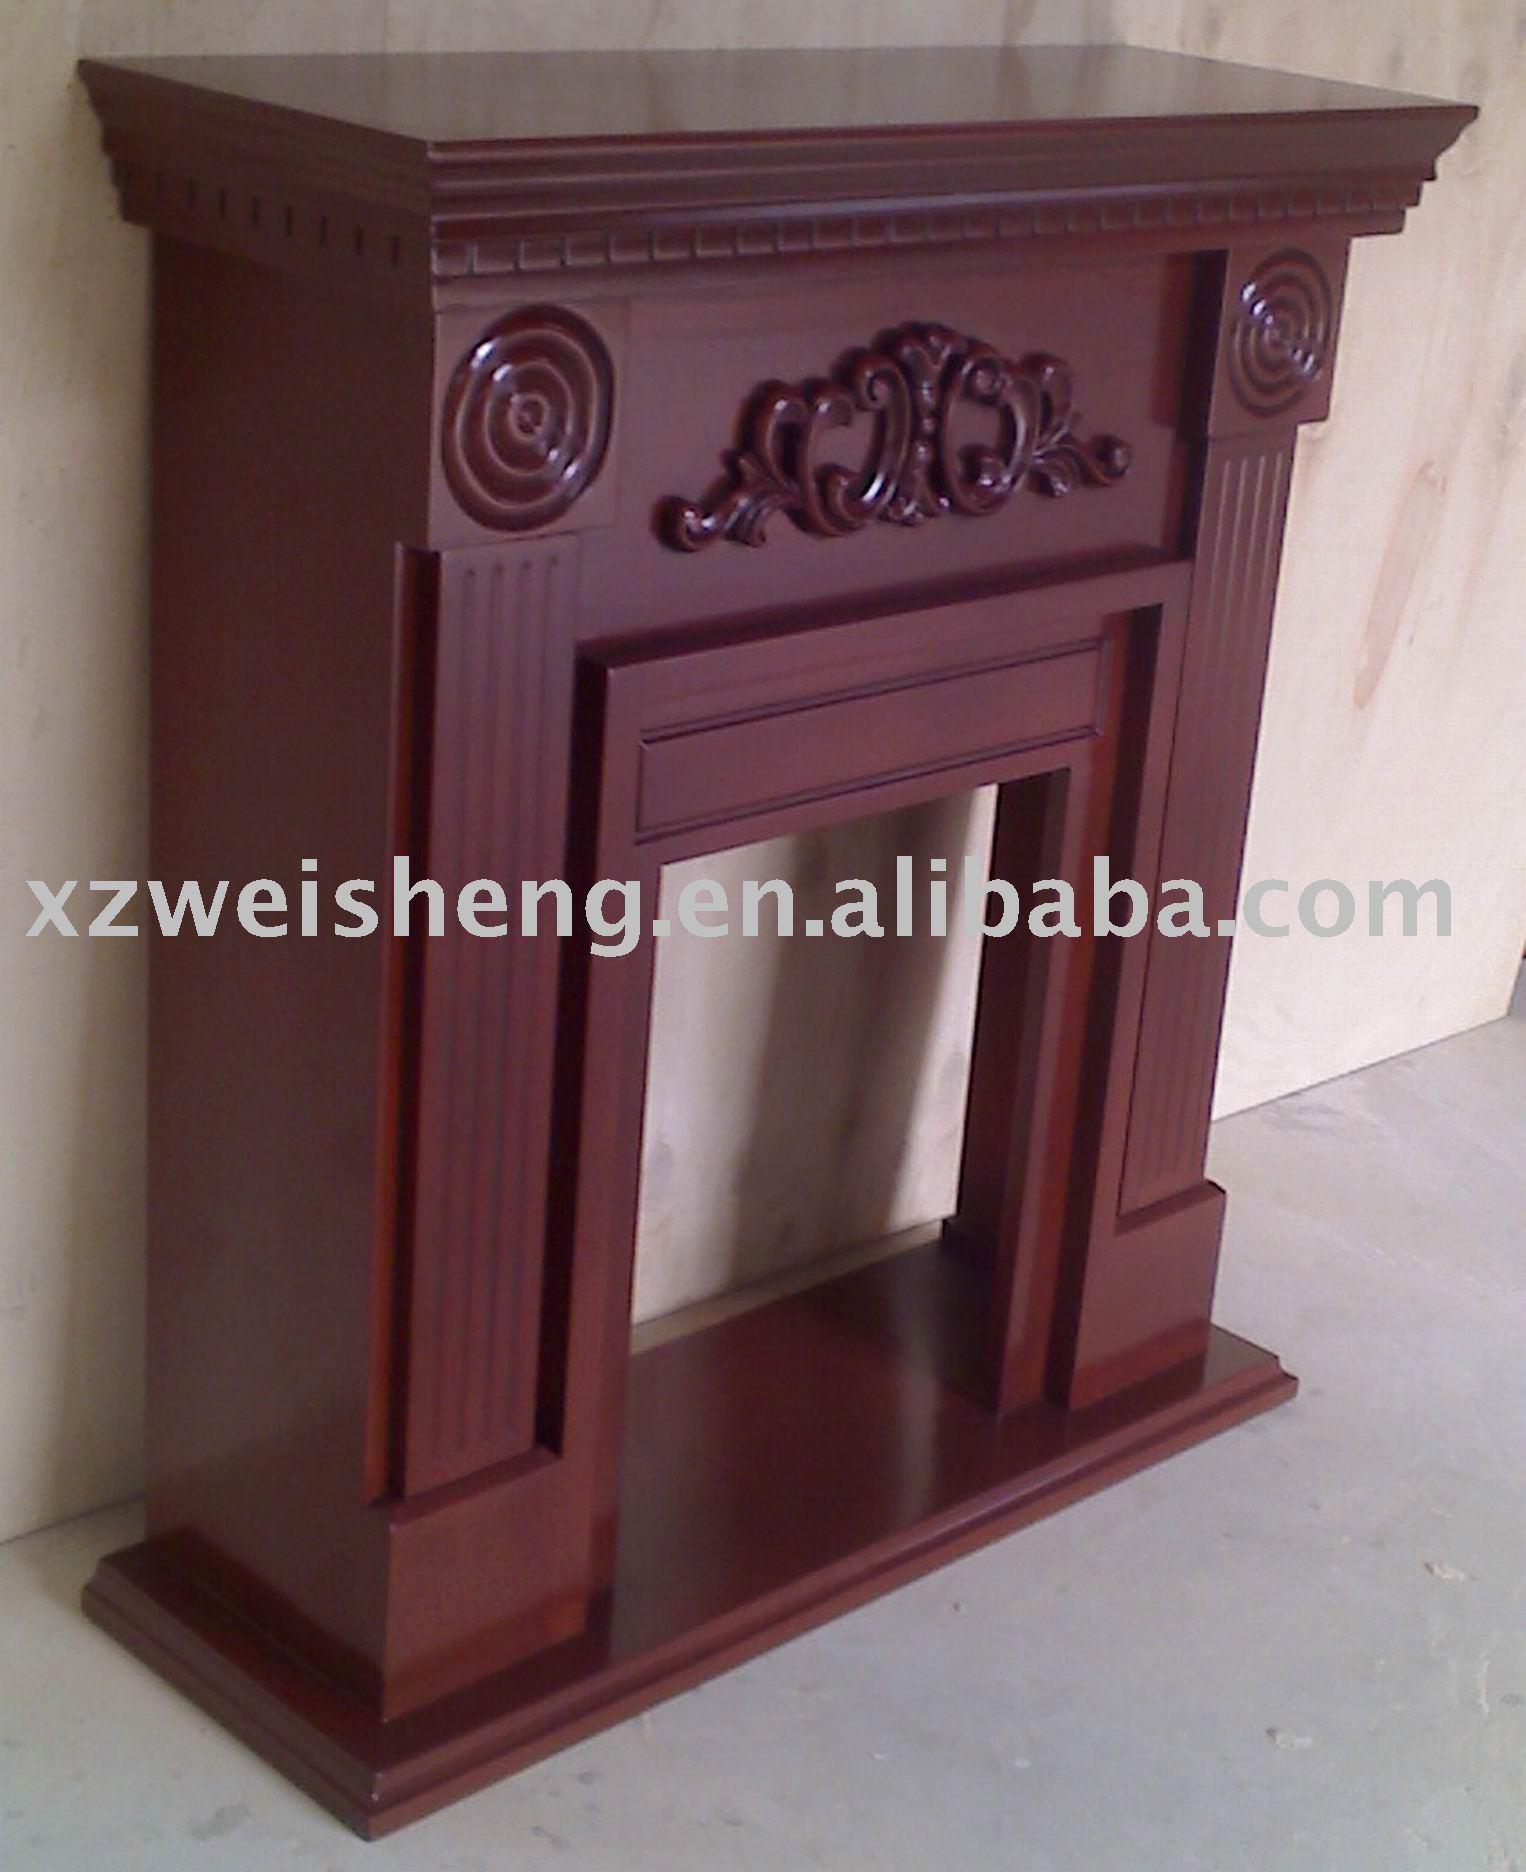 El ctrico de madera maciza repisa de la chimenea chimeneas - Como hacer chimeneas decorativas ...